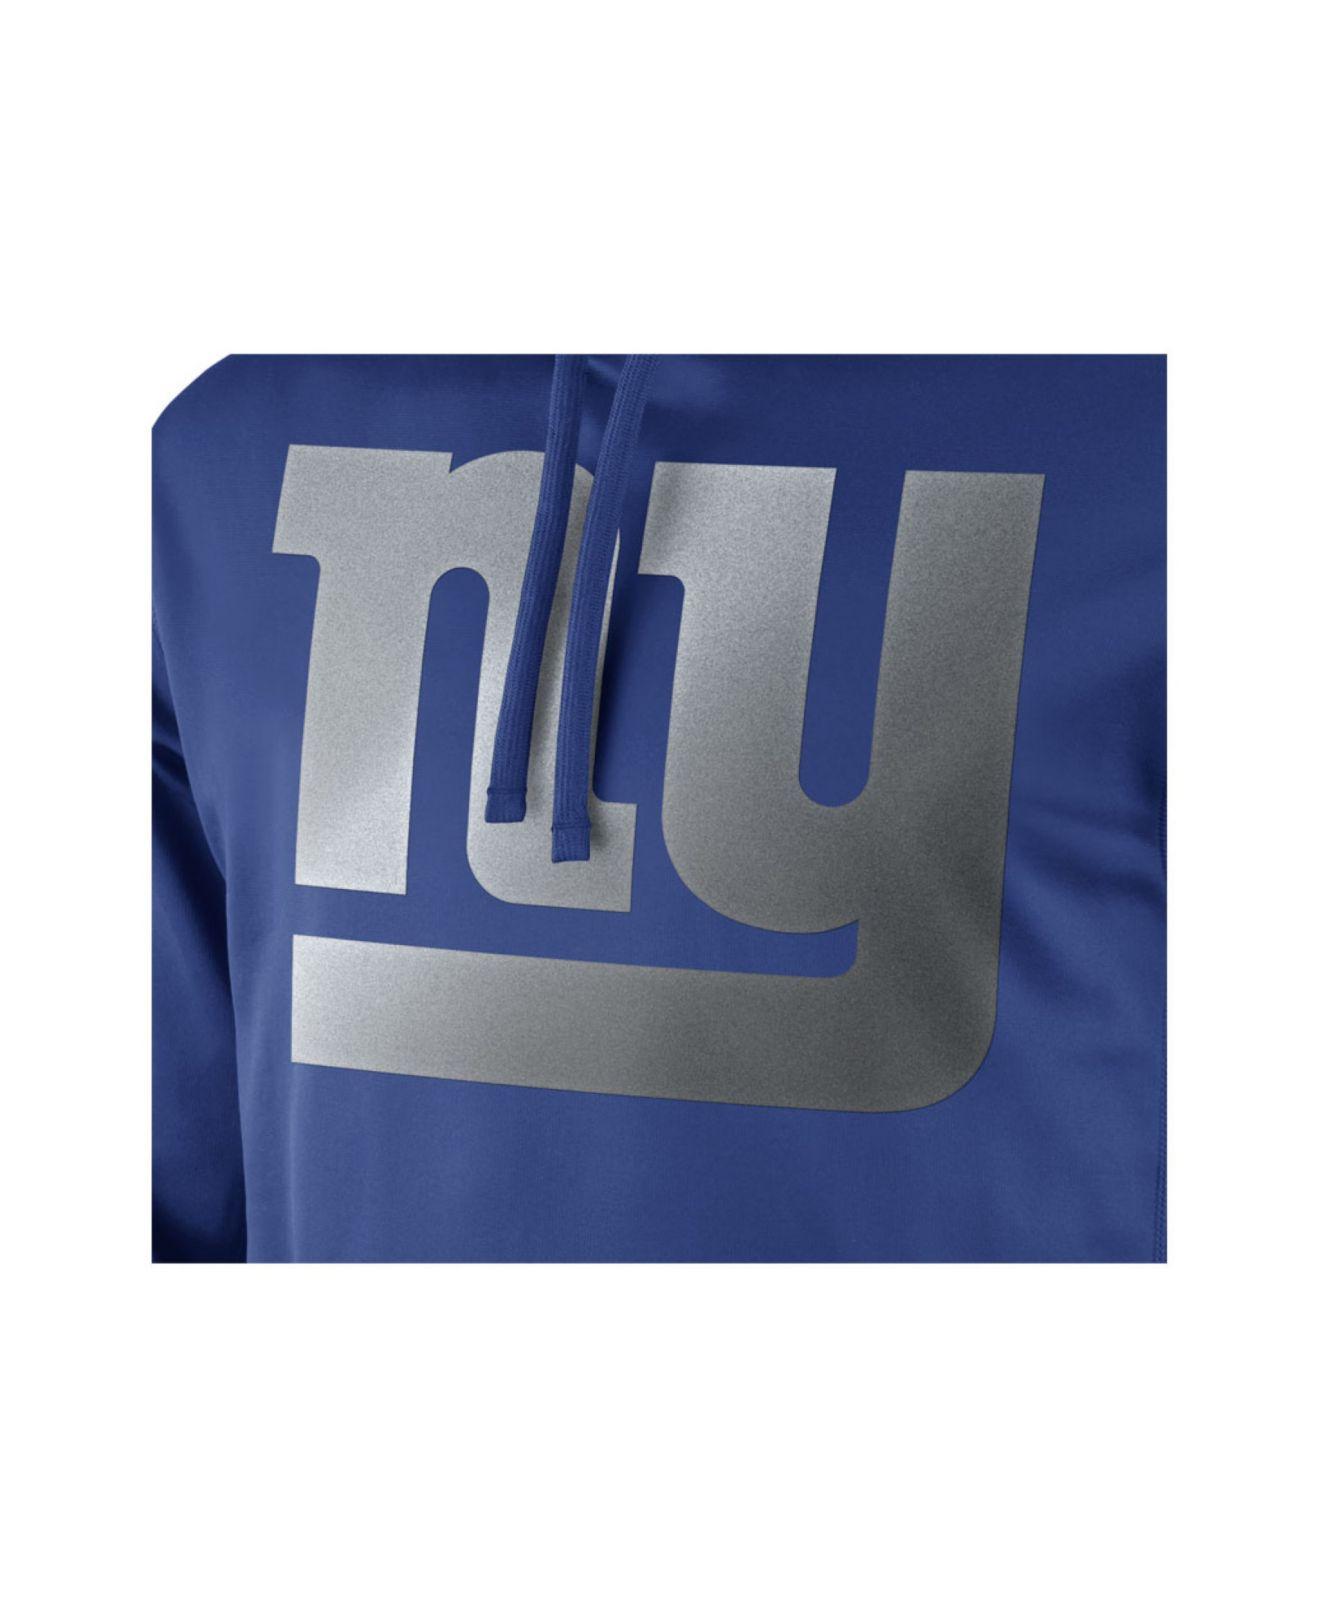 Lyst - Nike Men s New York Giants Reflective Ko Hoodie in Blue for Men 363c65cc3